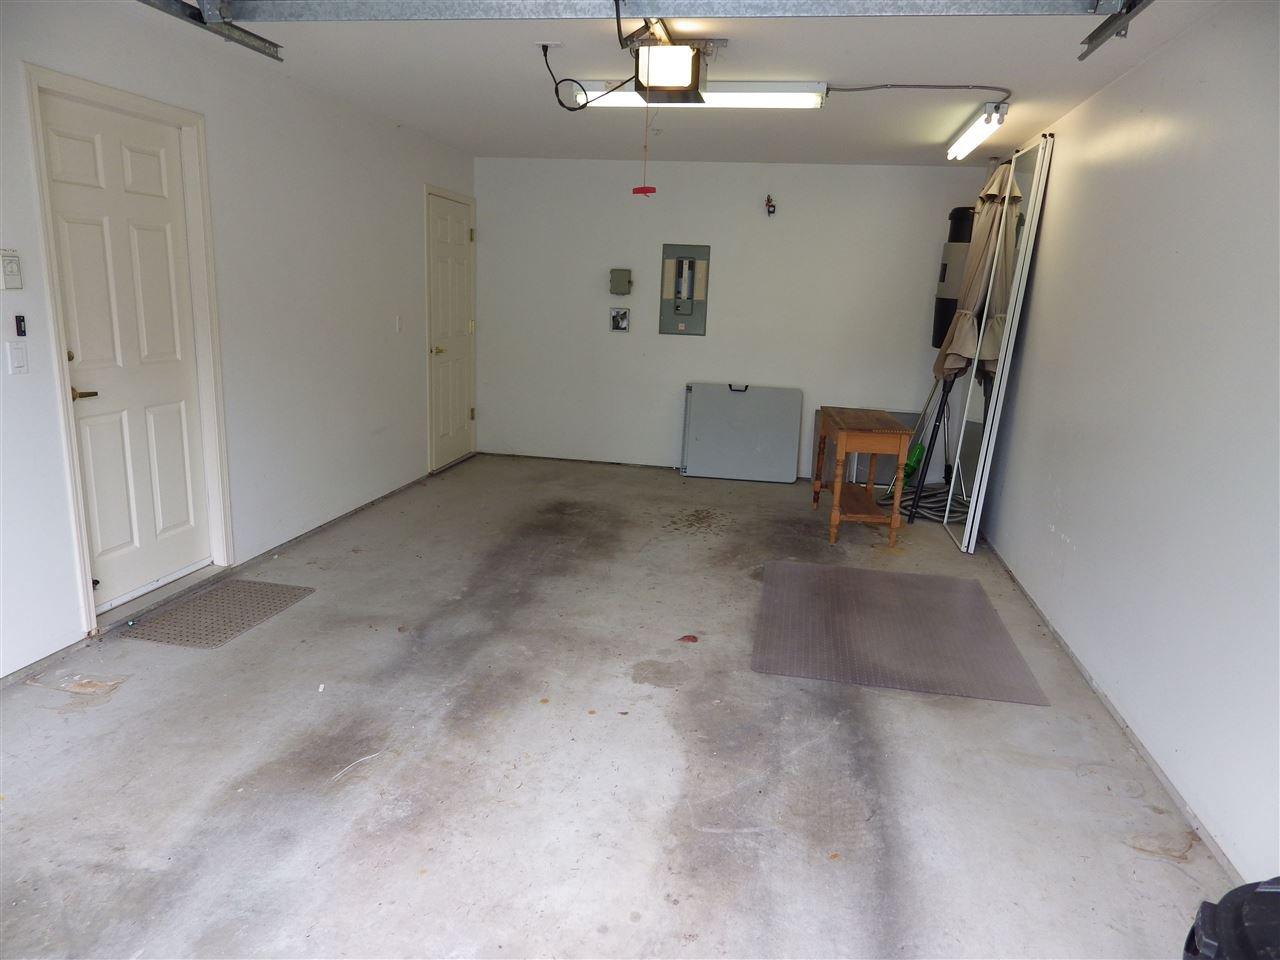 Photo 11: Photos: 207 1585 FIELD Road in Sechelt: Sechelt District Condo for sale (Sunshine Coast)  : MLS®# R2471792